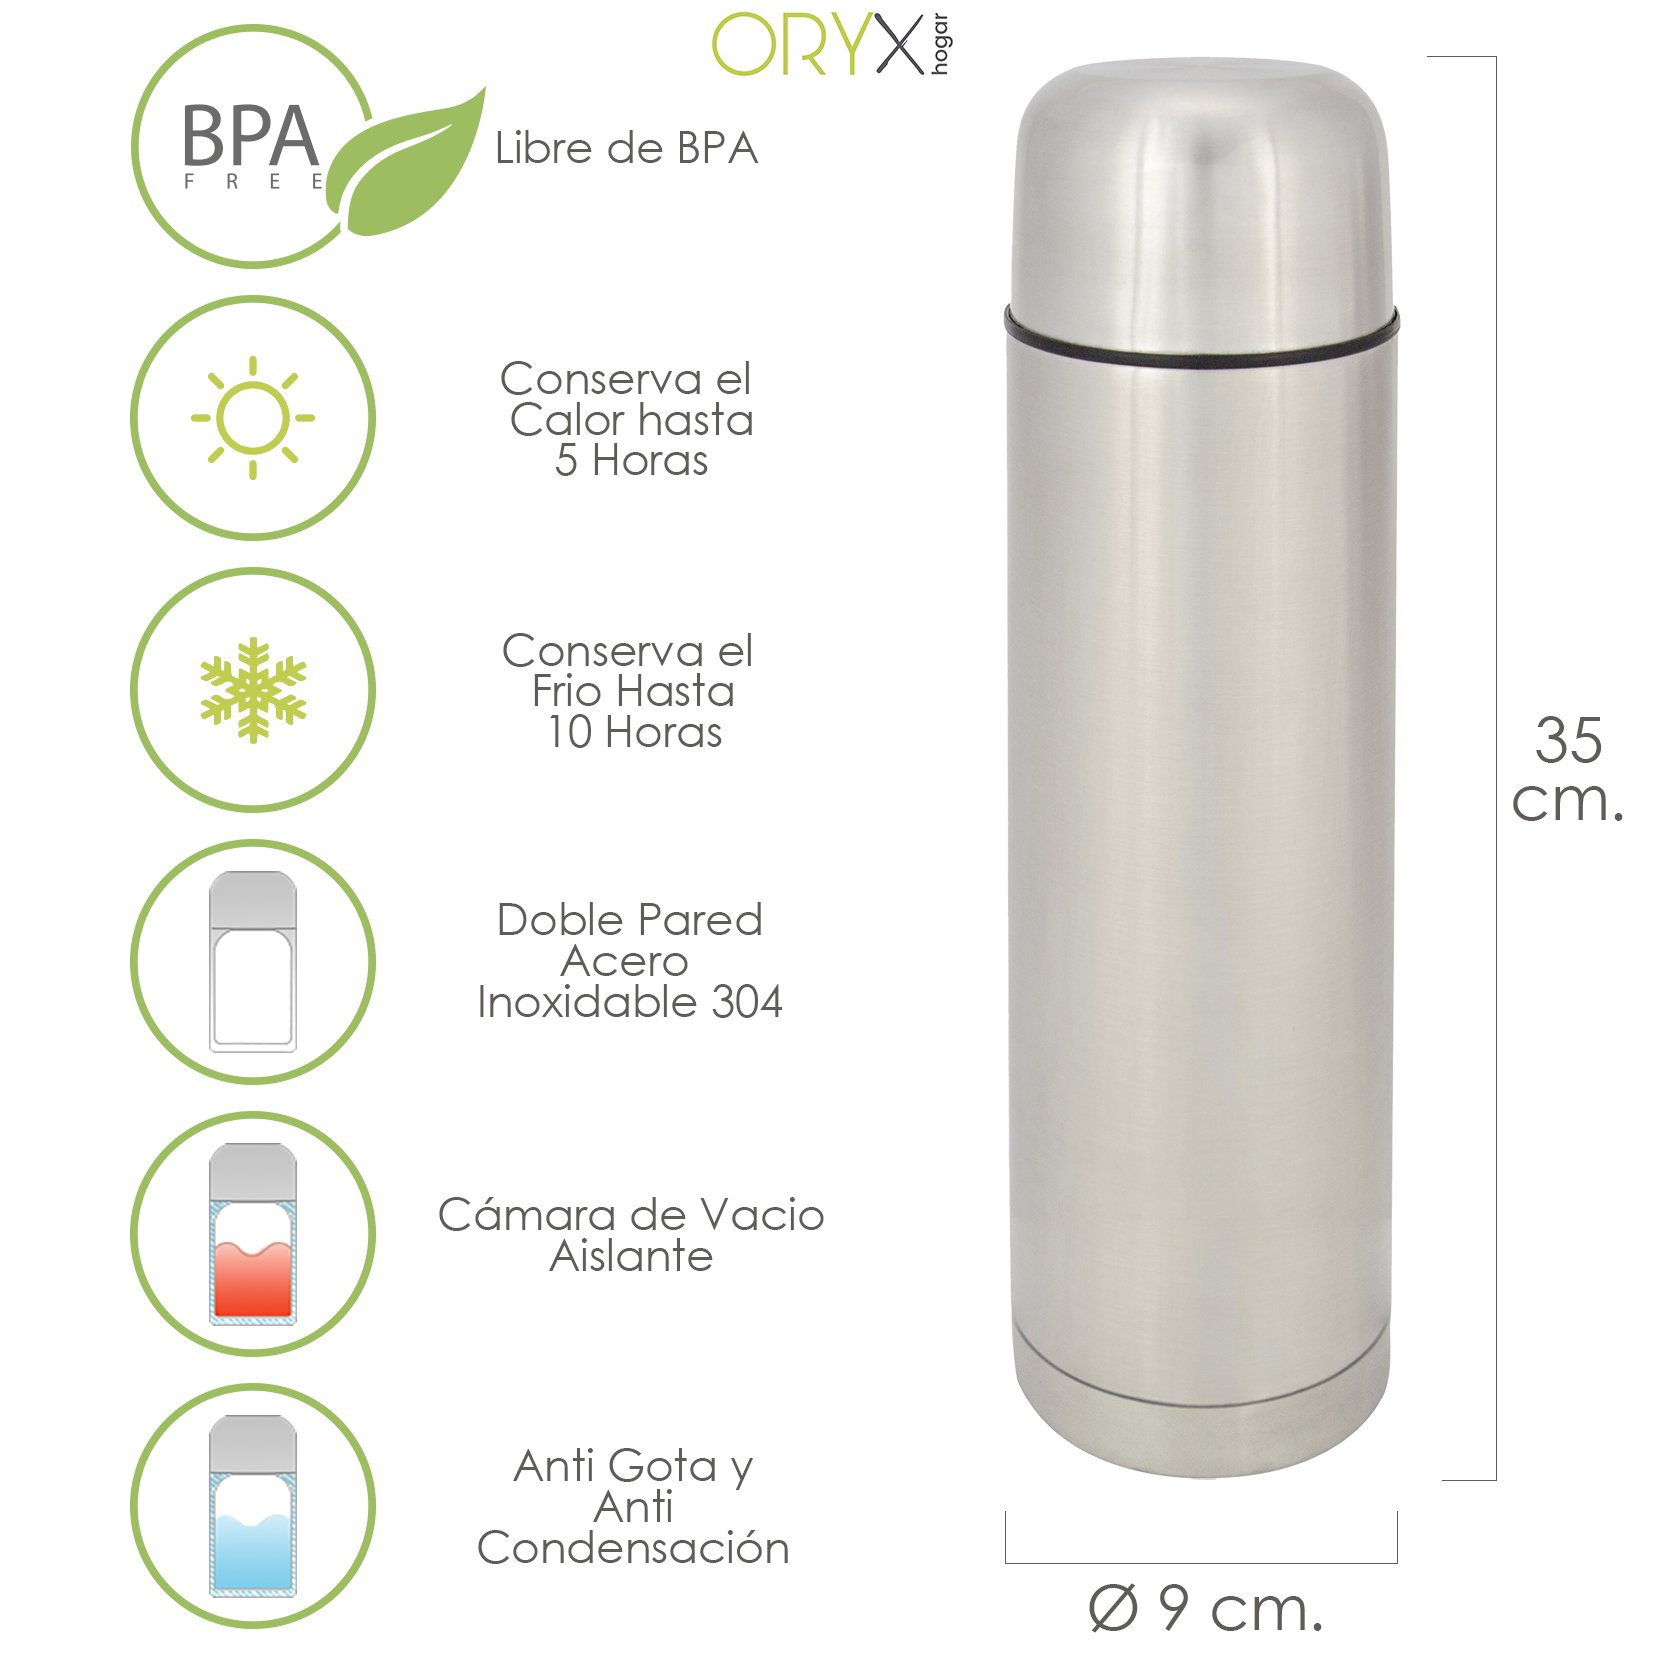 Oryx 5075015 Termo Liquidos Acero Inoxidable Antigoteo 1 Litro: Amazon.es: Hogar